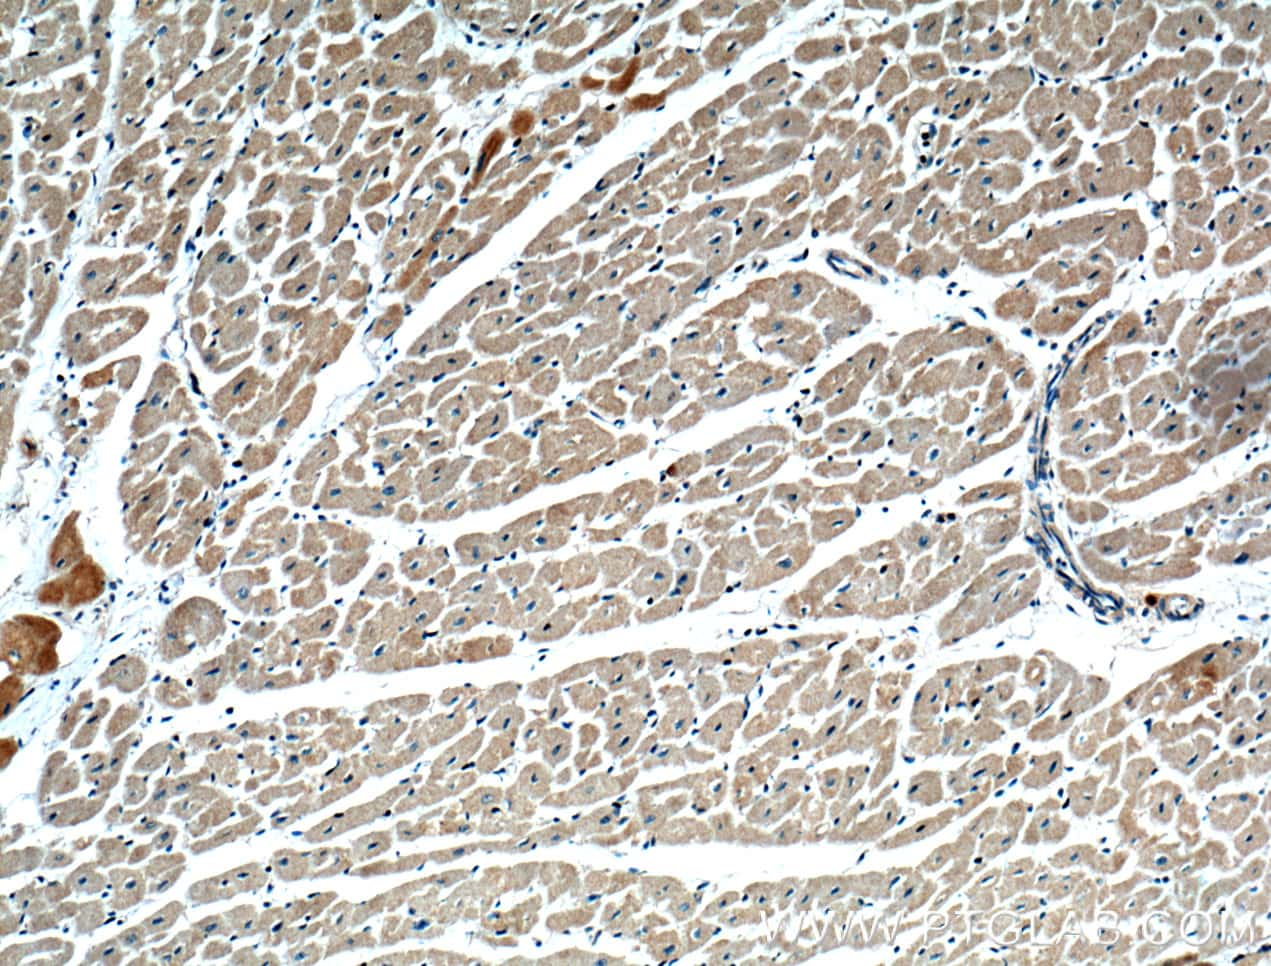 SAMD8 Antibody in Immunohistochemistry (Paraffin) (IHC (P))